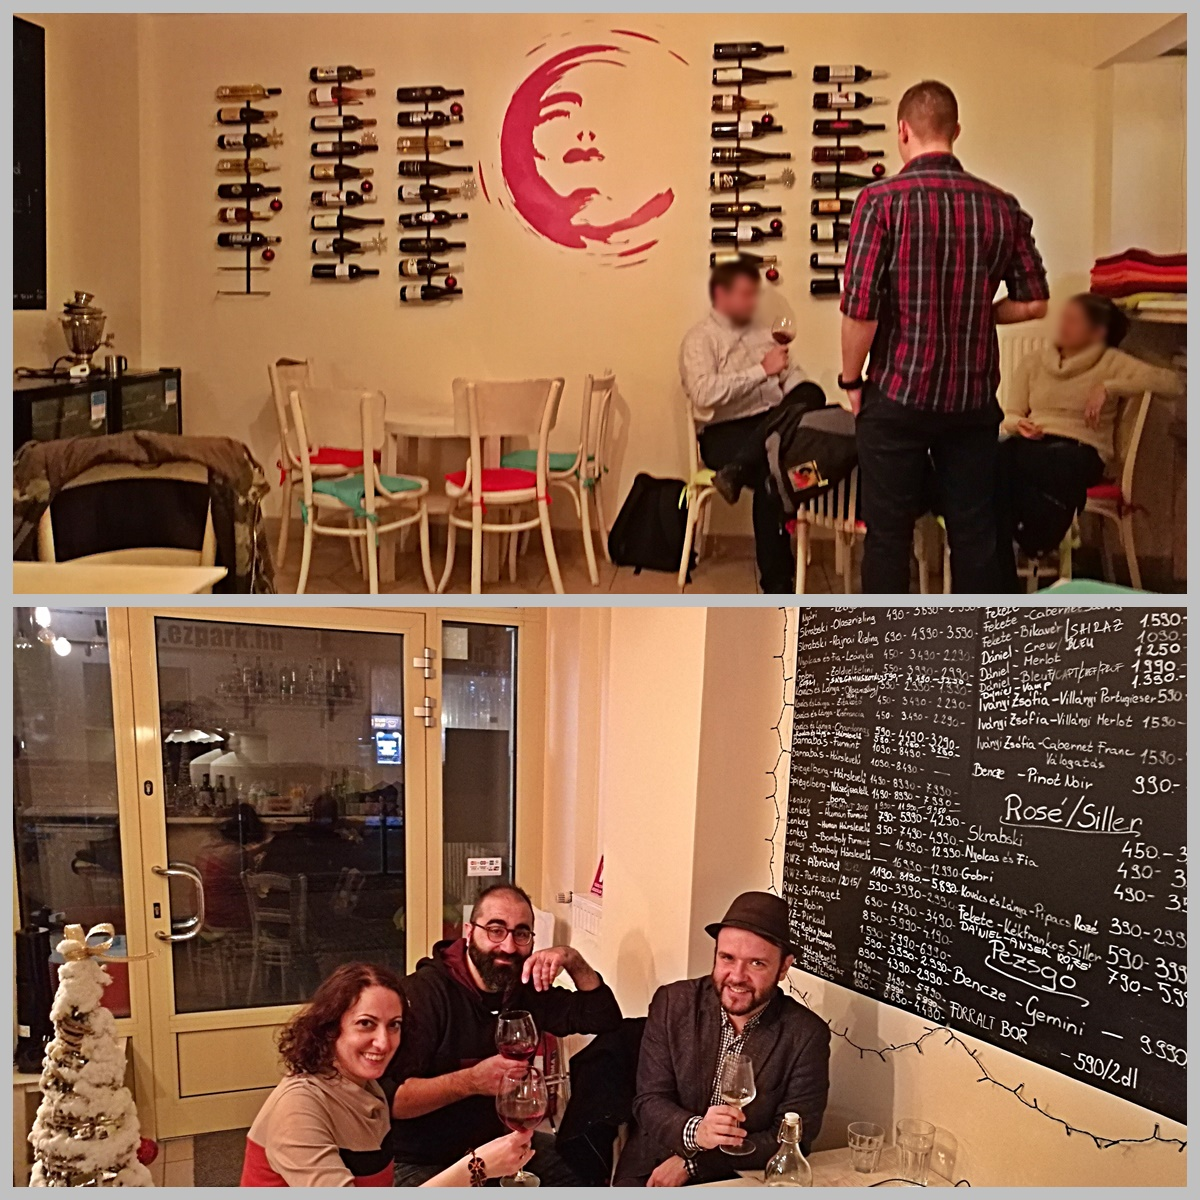 Budapesti kocsmatúra olasz szemmel - Wine&U - Kocsmaturista